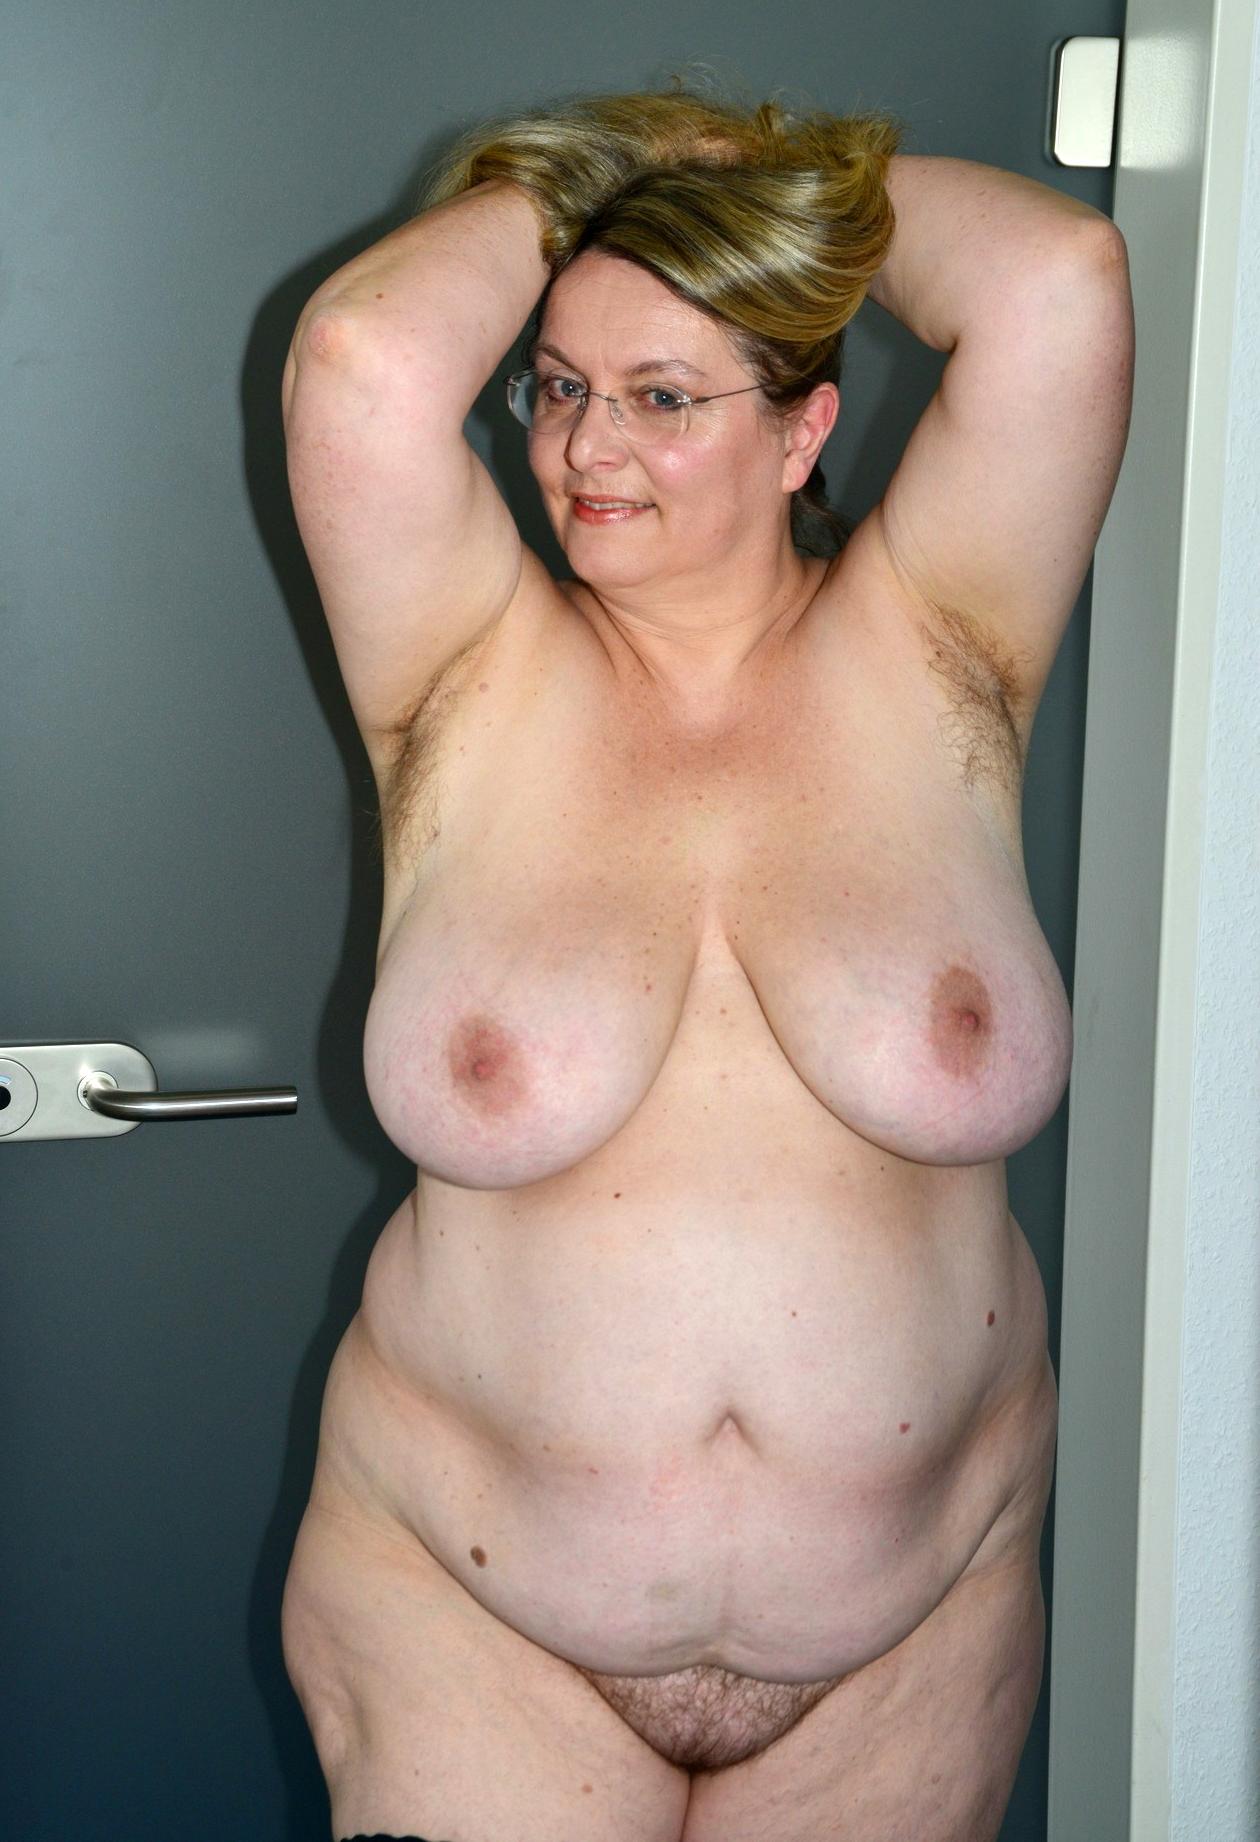 Fully hairy body girl womenxxx